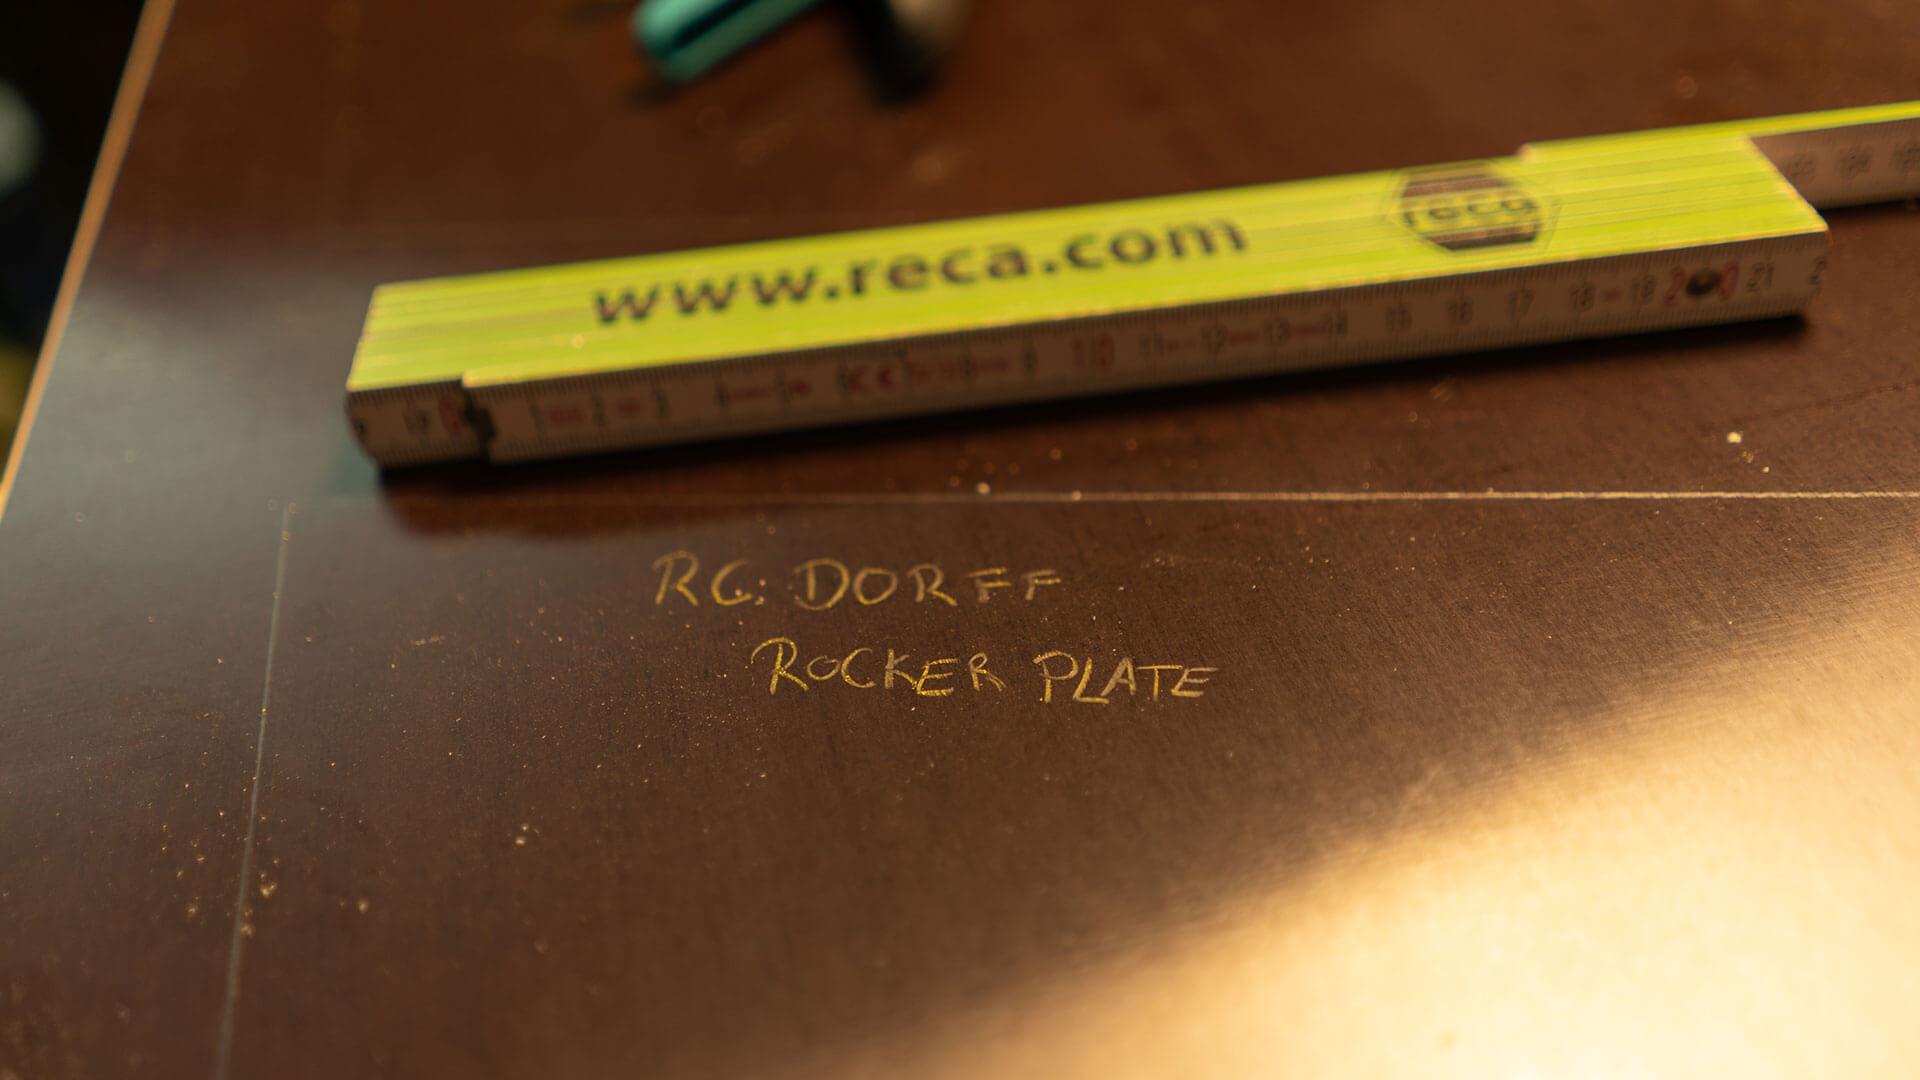 Rocker Plate RC Dorff